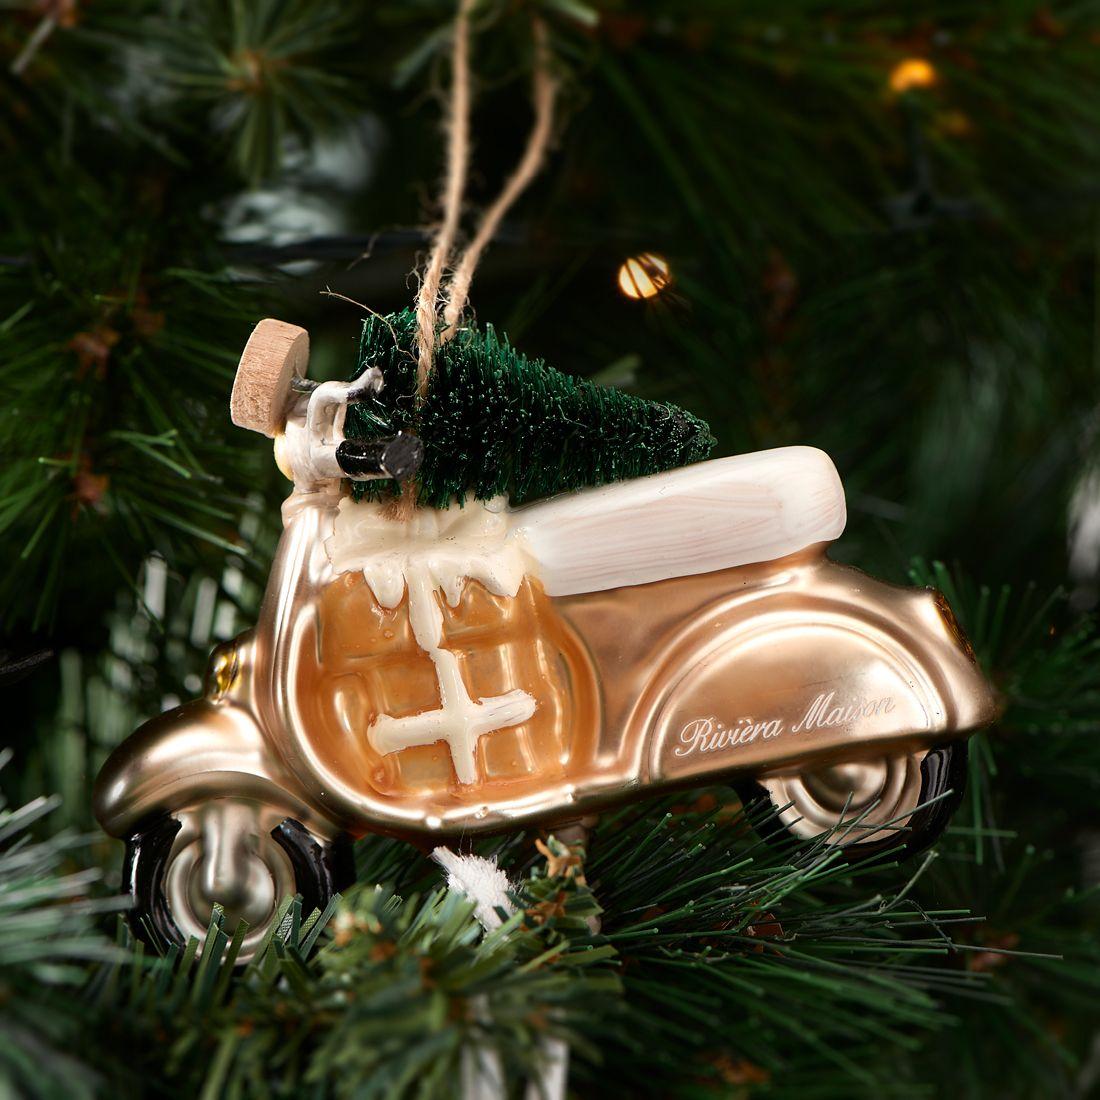 Julekugle scooter – Christmas Scooter Ornament